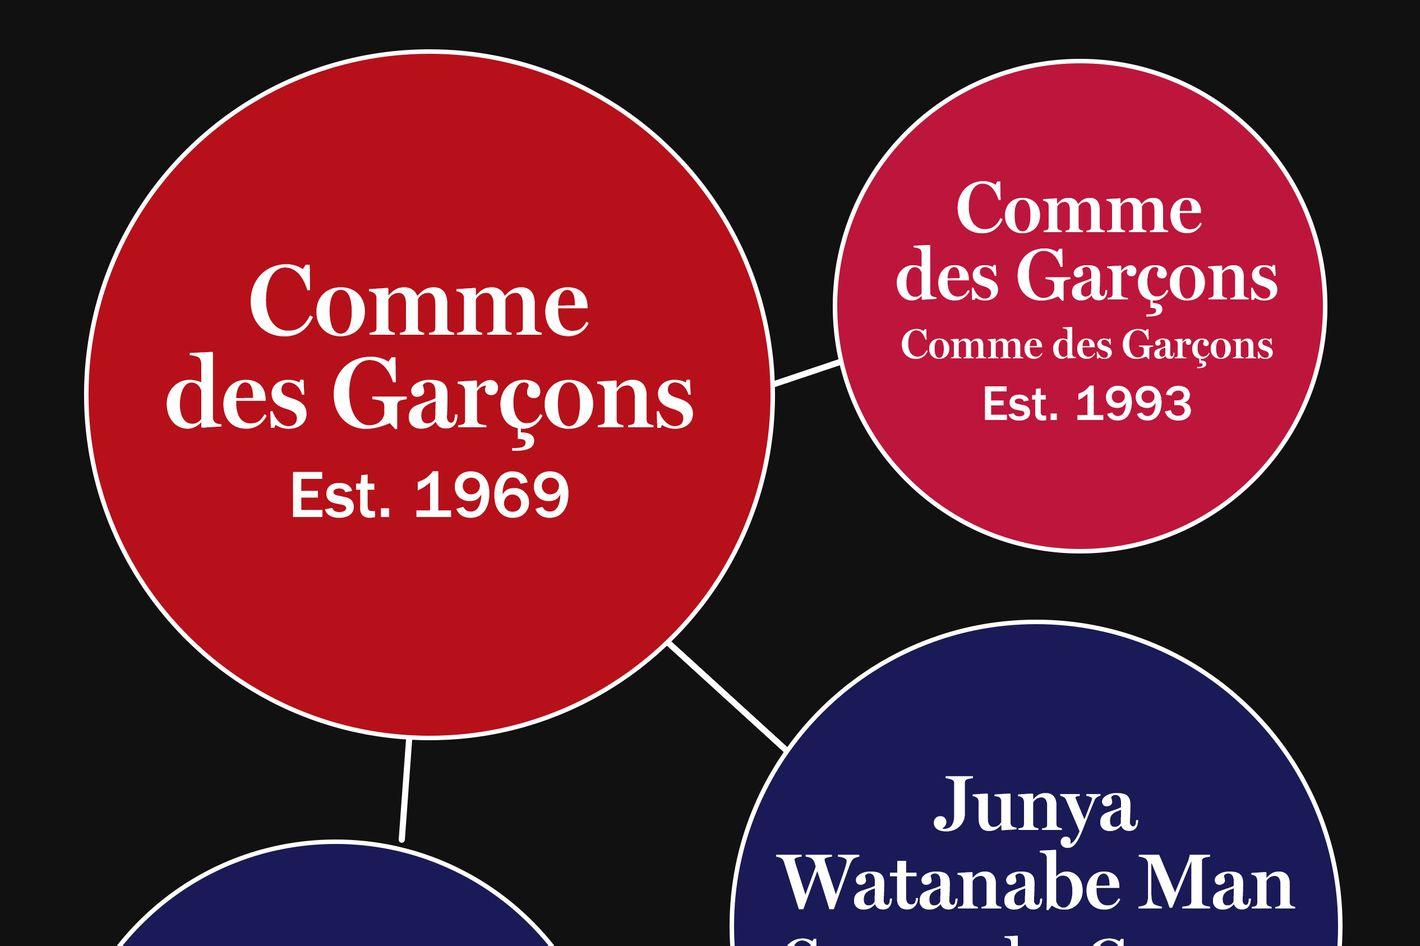 The Comme des Garçons Empire in Chart Form